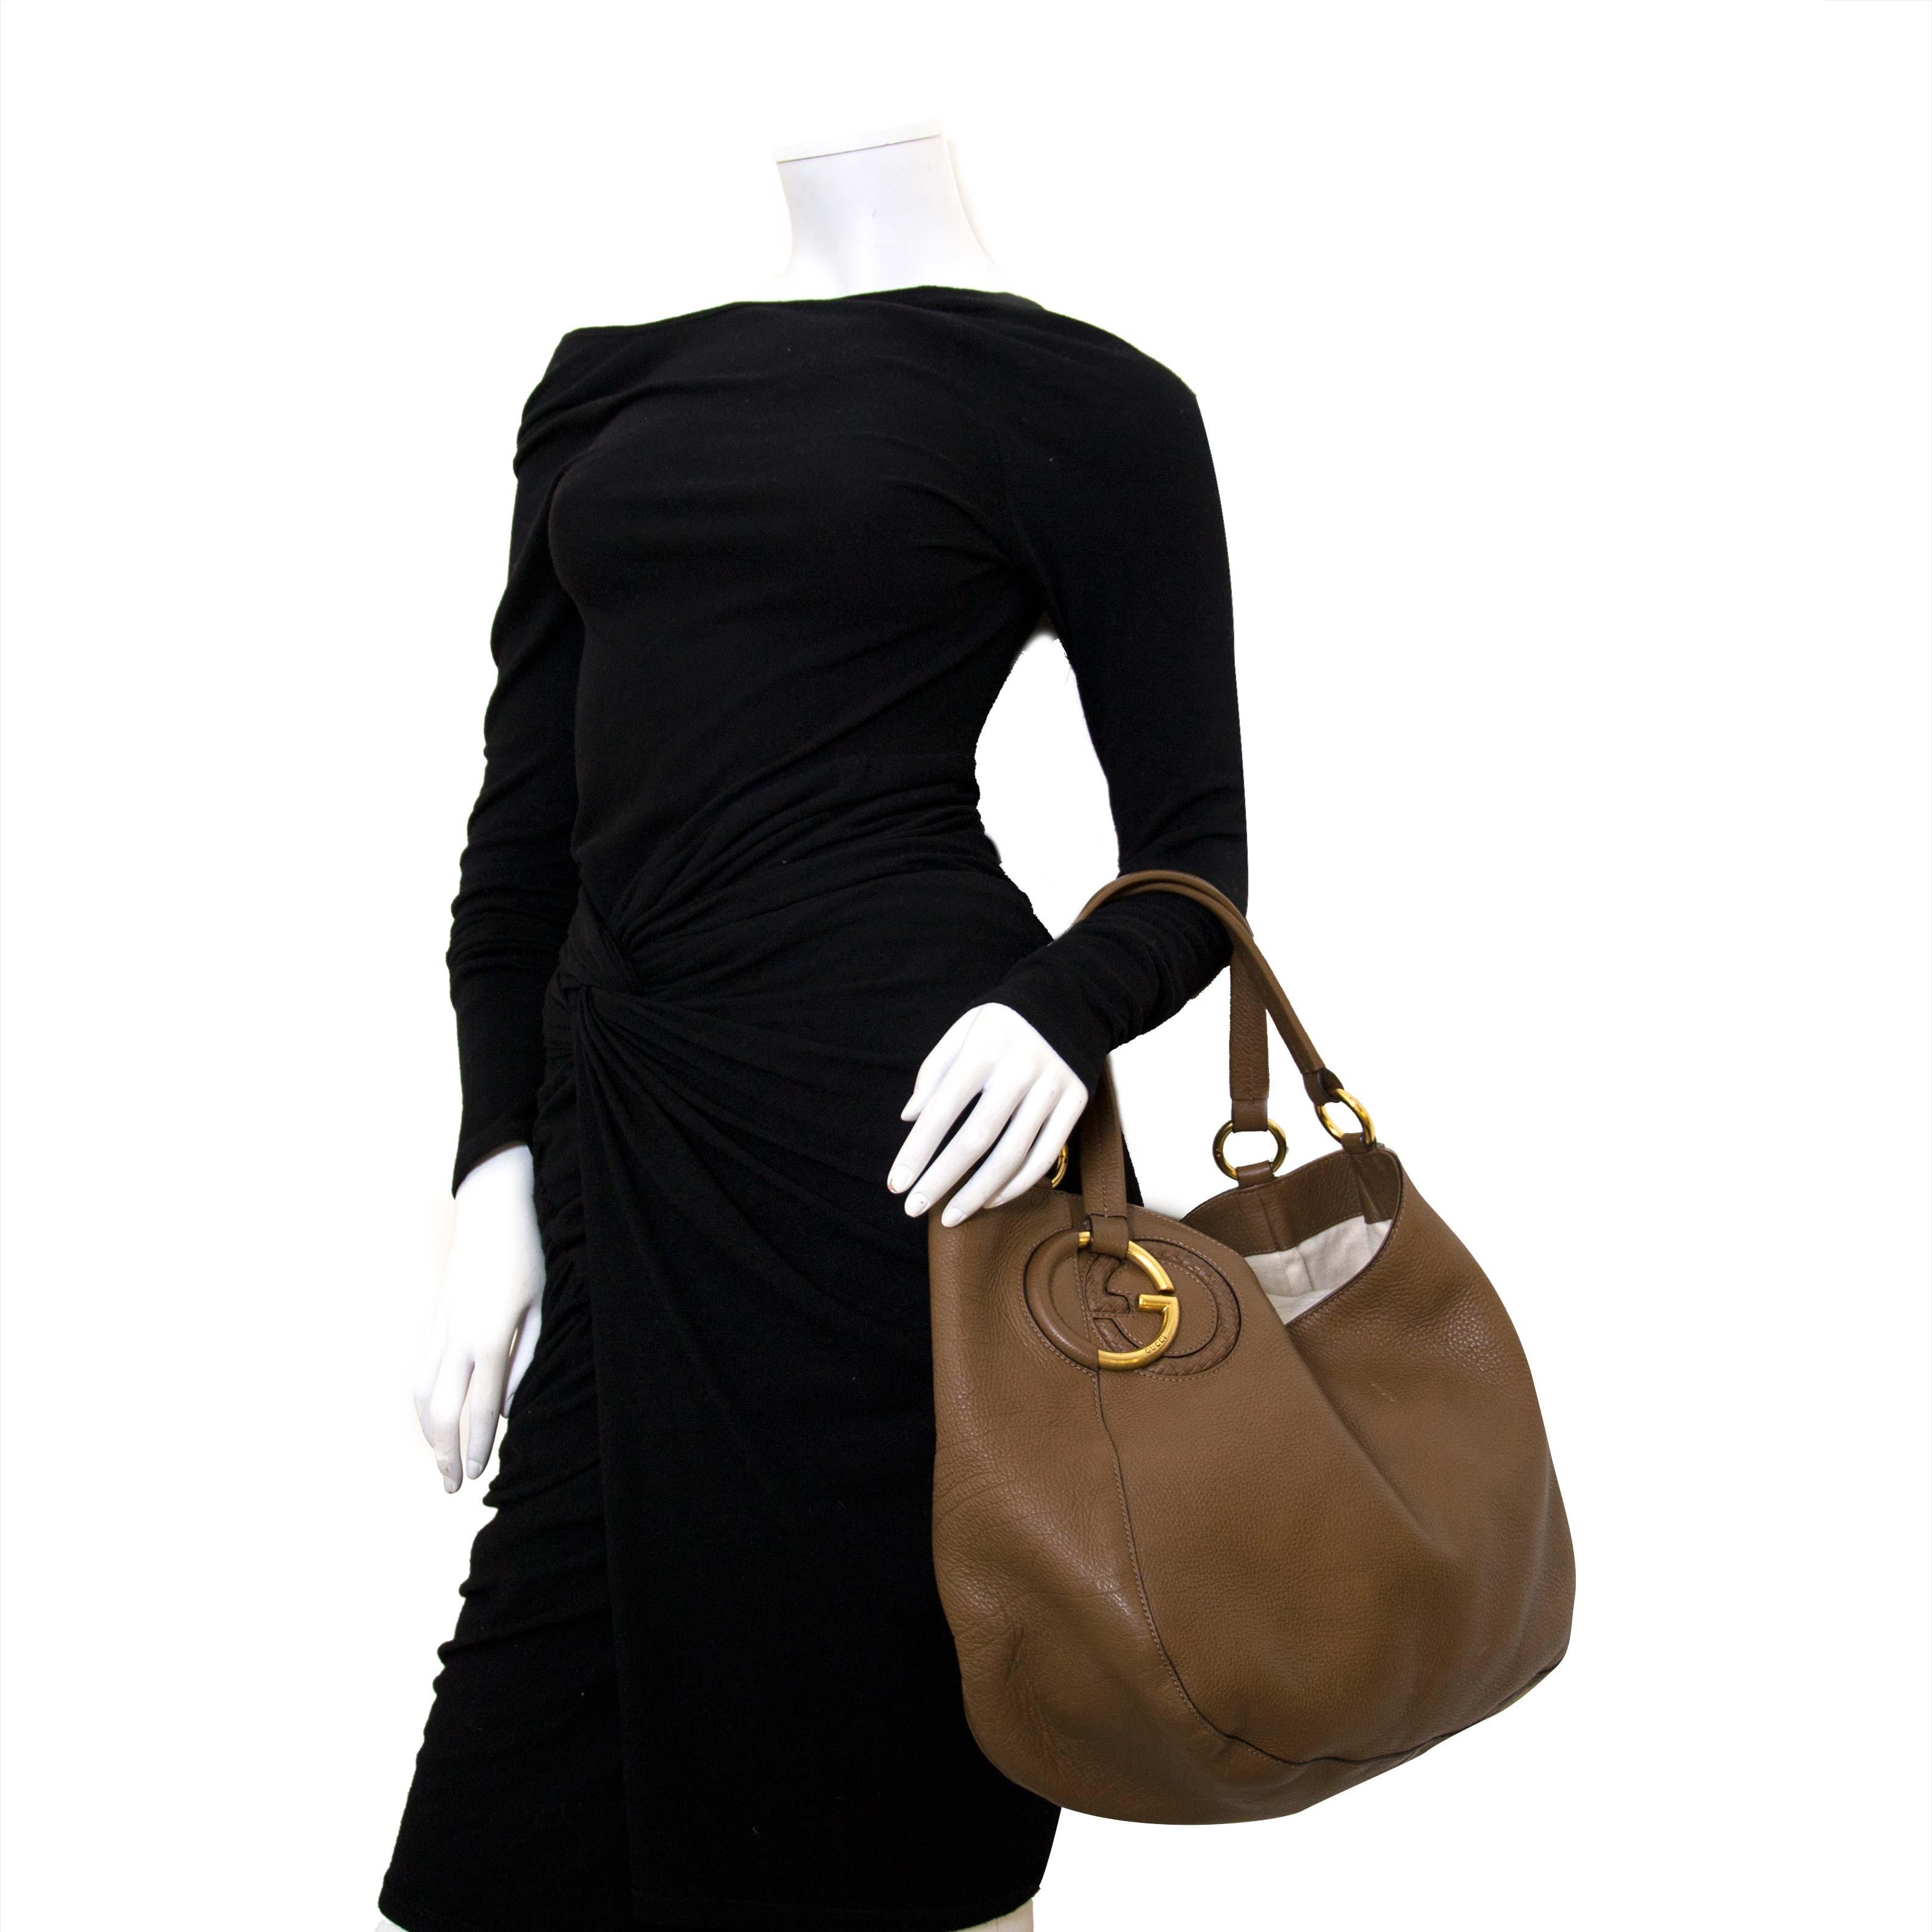 1651458b630f Labellov Buy authentic vintagePrada designer bags, shoes, clothes ...